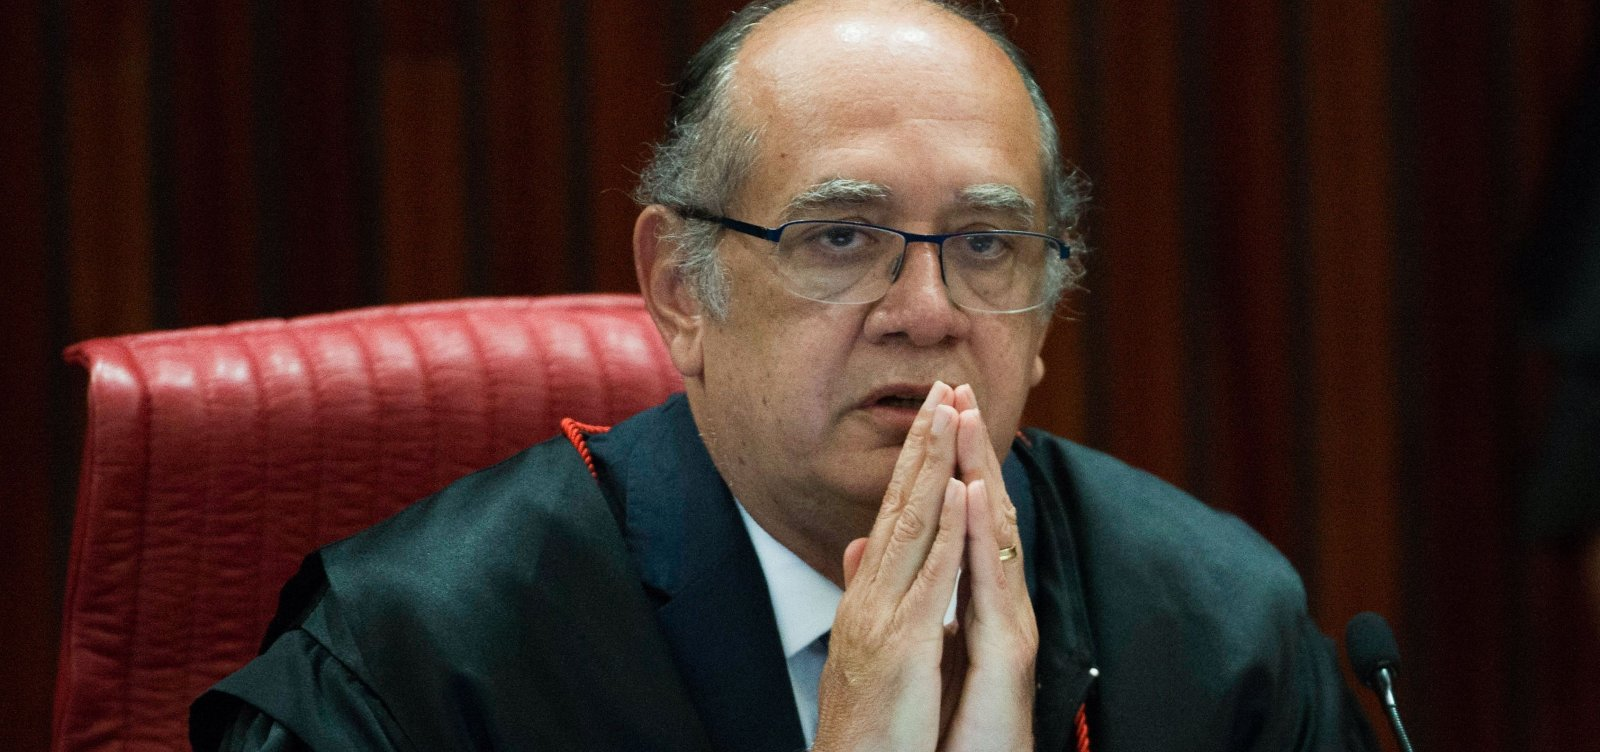 [Prova obtida ilegalmente pode ser válida, diz Gilmar sobre caso Moro]